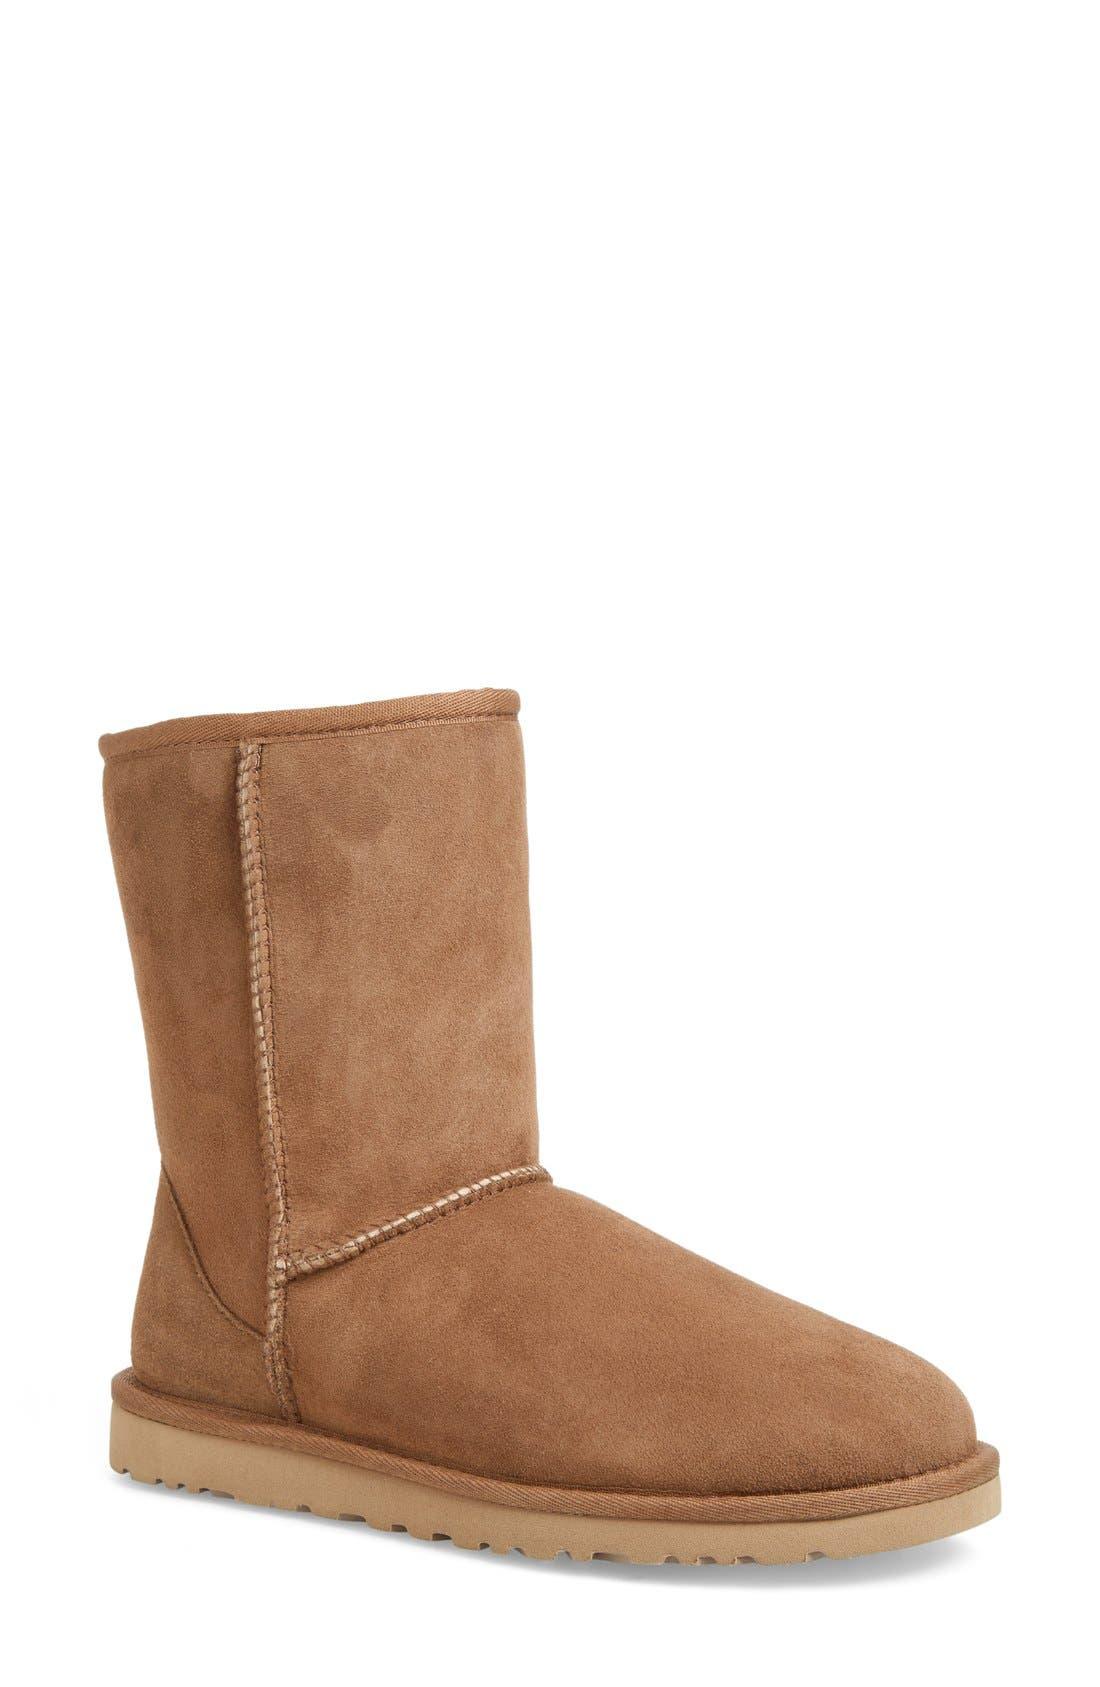 Main Image - UGG® 'Classic Short' Boot (Women)